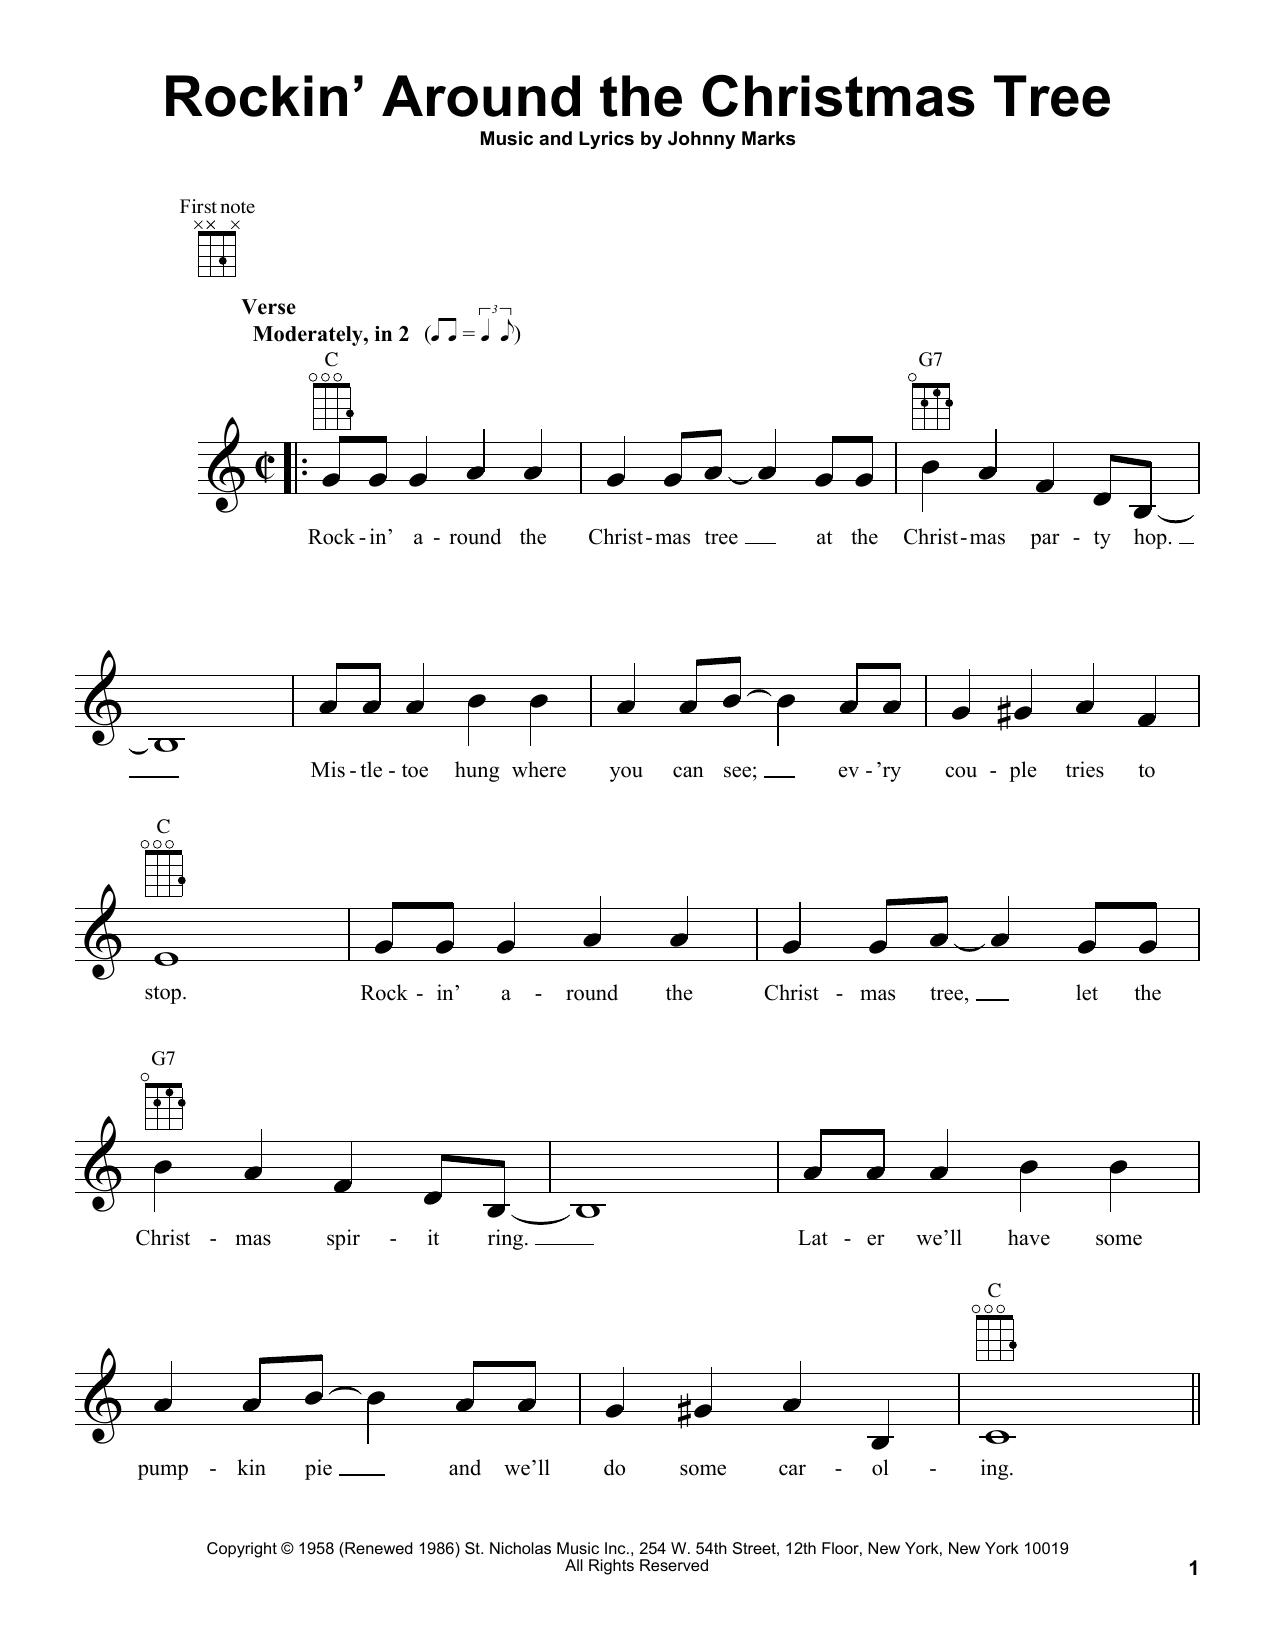 LeAnn Rimes - Rockin' Around The Christmas Tree